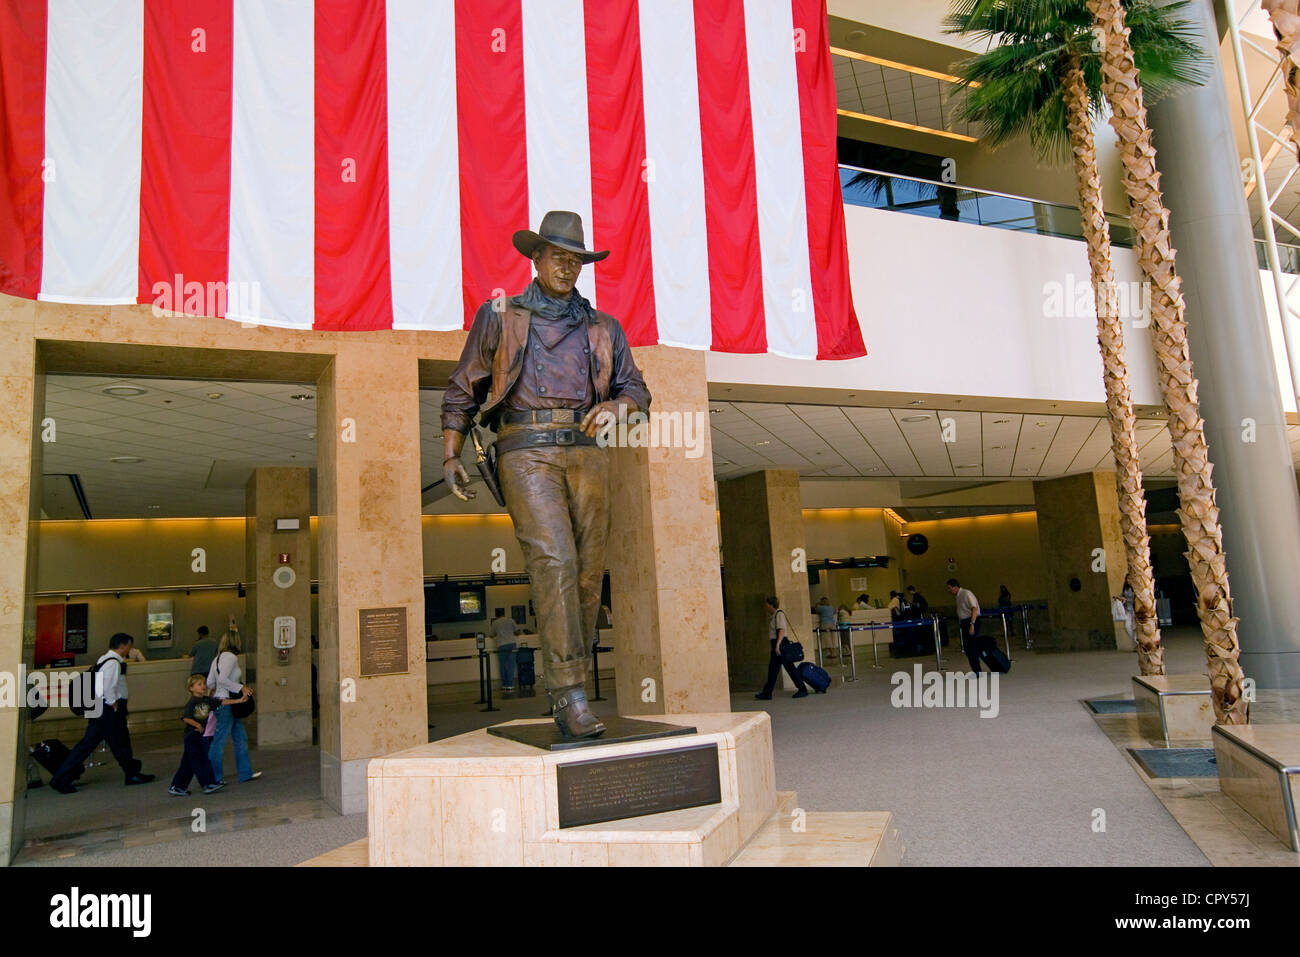 A larger-than-life statue honors famous film star John Wayne at John Wayne Airport in Santa Ana, Orange County, - Stock Image